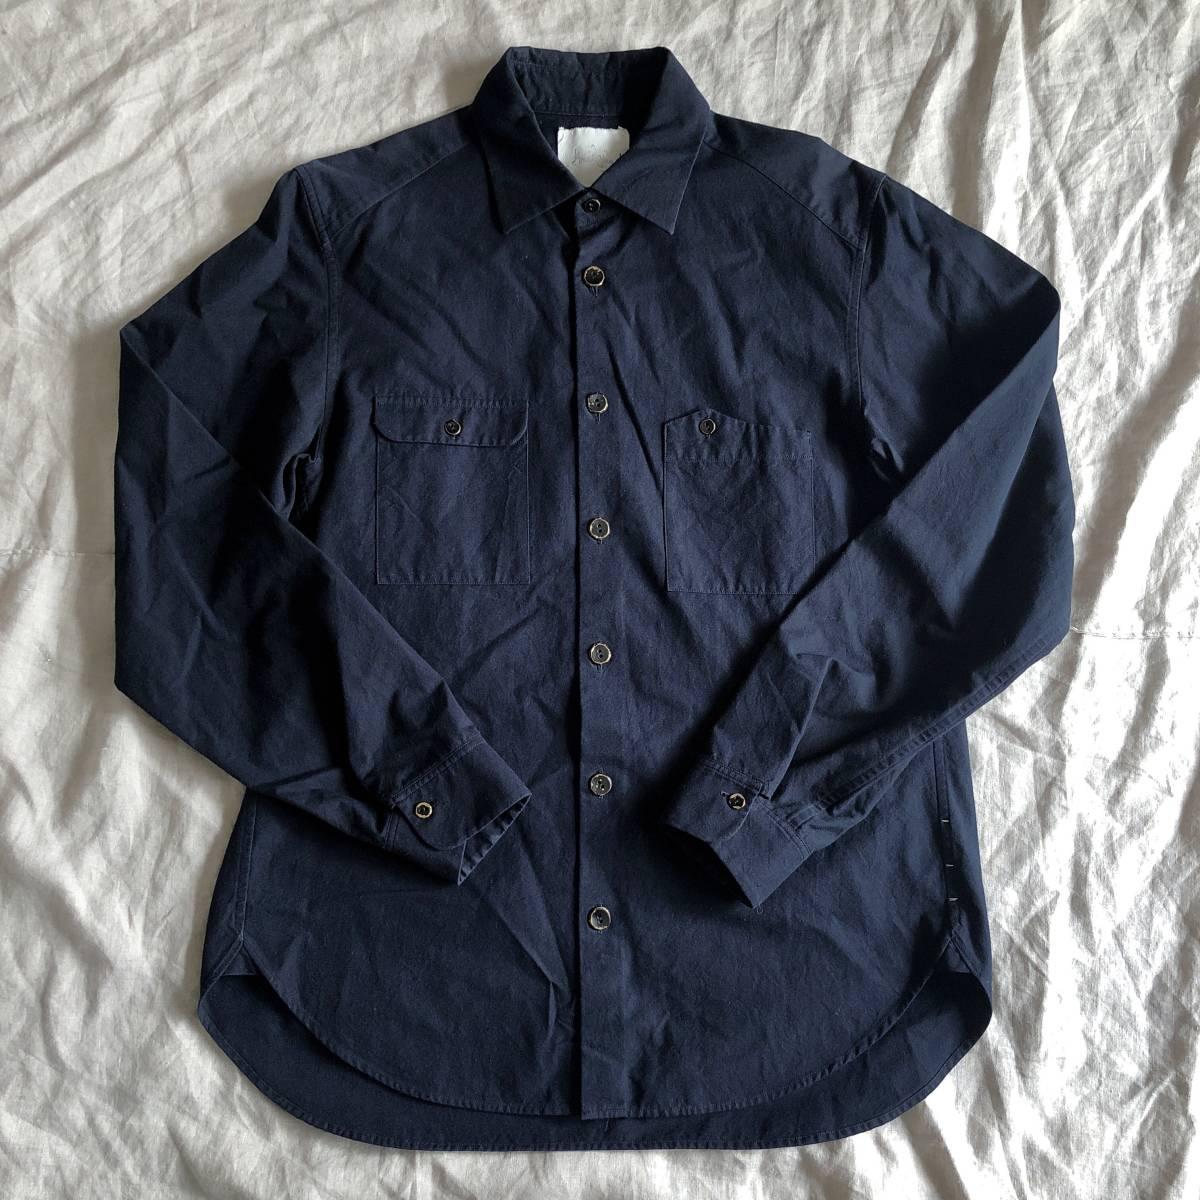 Araki Yuu 17AW Double pocket shirt jacket Nero_navy/Black button SIZE1 アラキユウ/シャツ/ジャケット_画像5